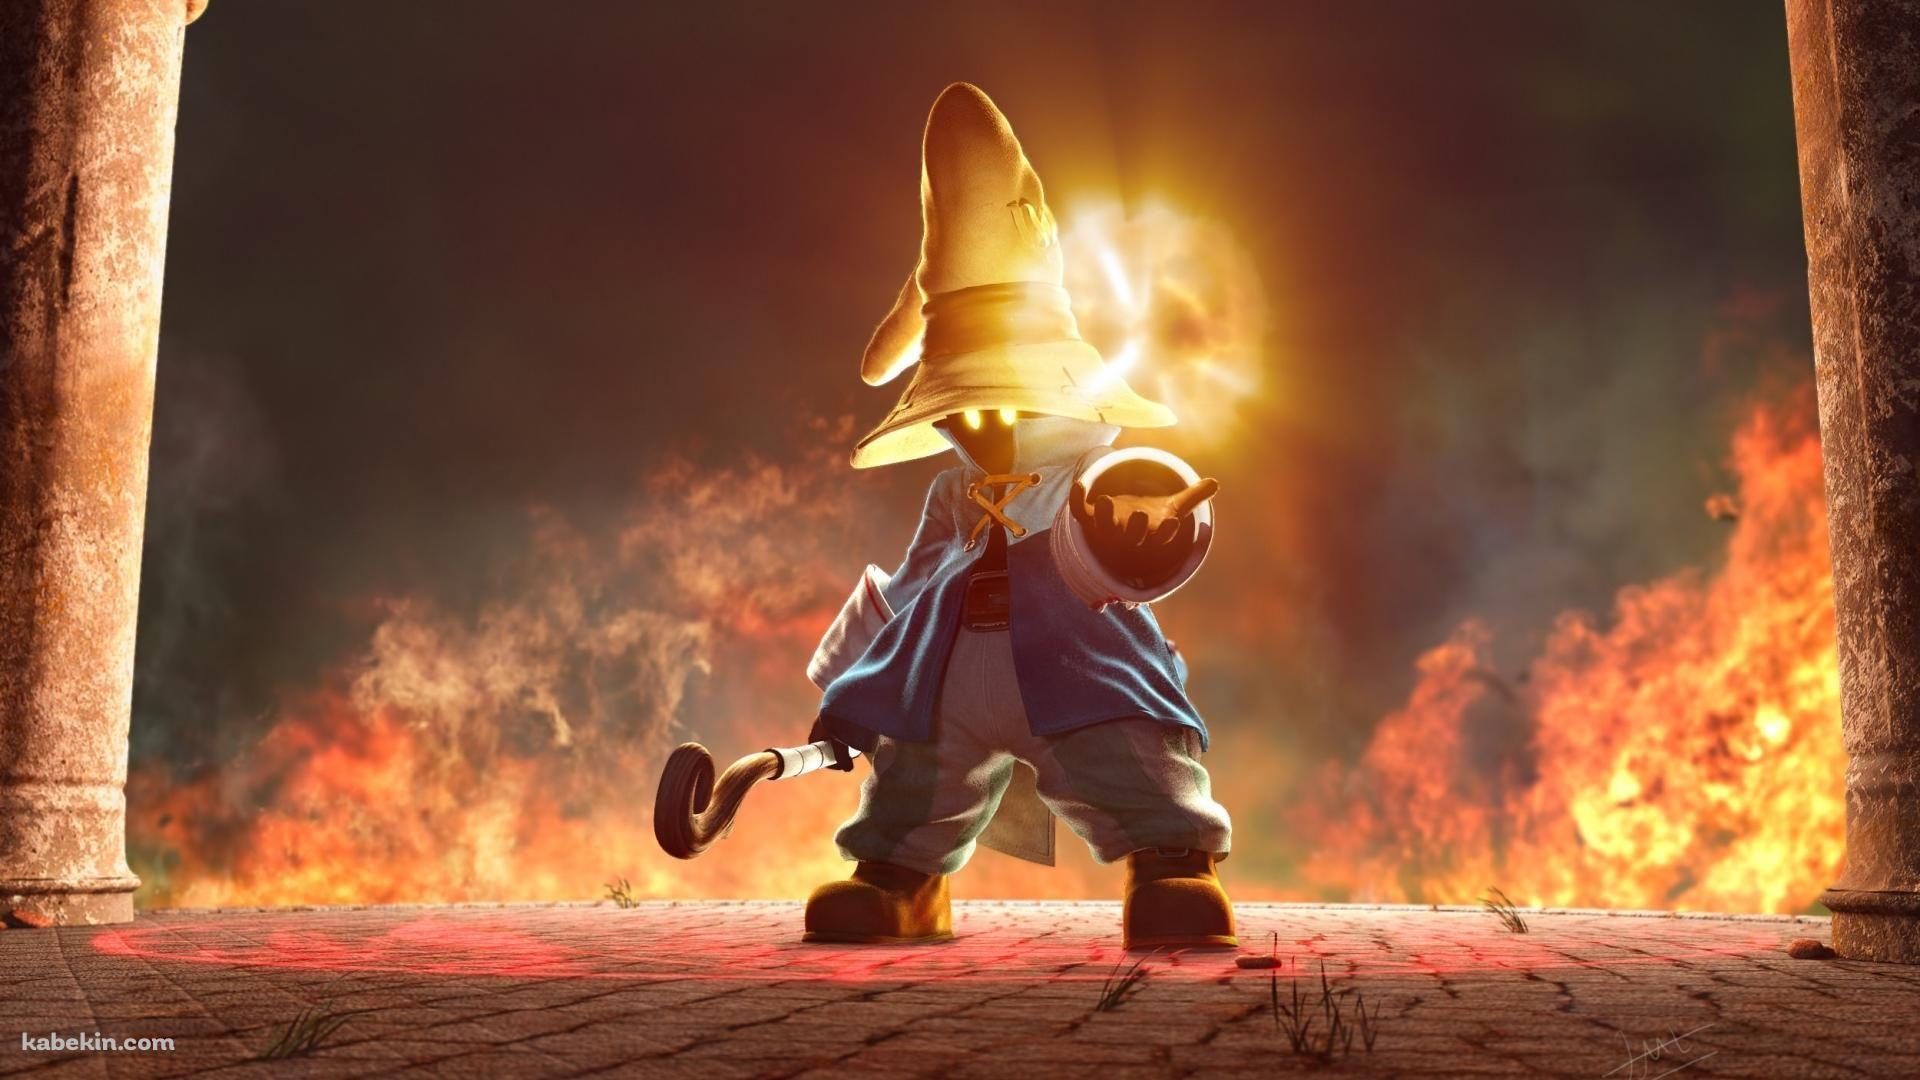 Ff 黒魔導師 ビビの壁紙 魔導師 Ff イラスト ファンタジーゲーム